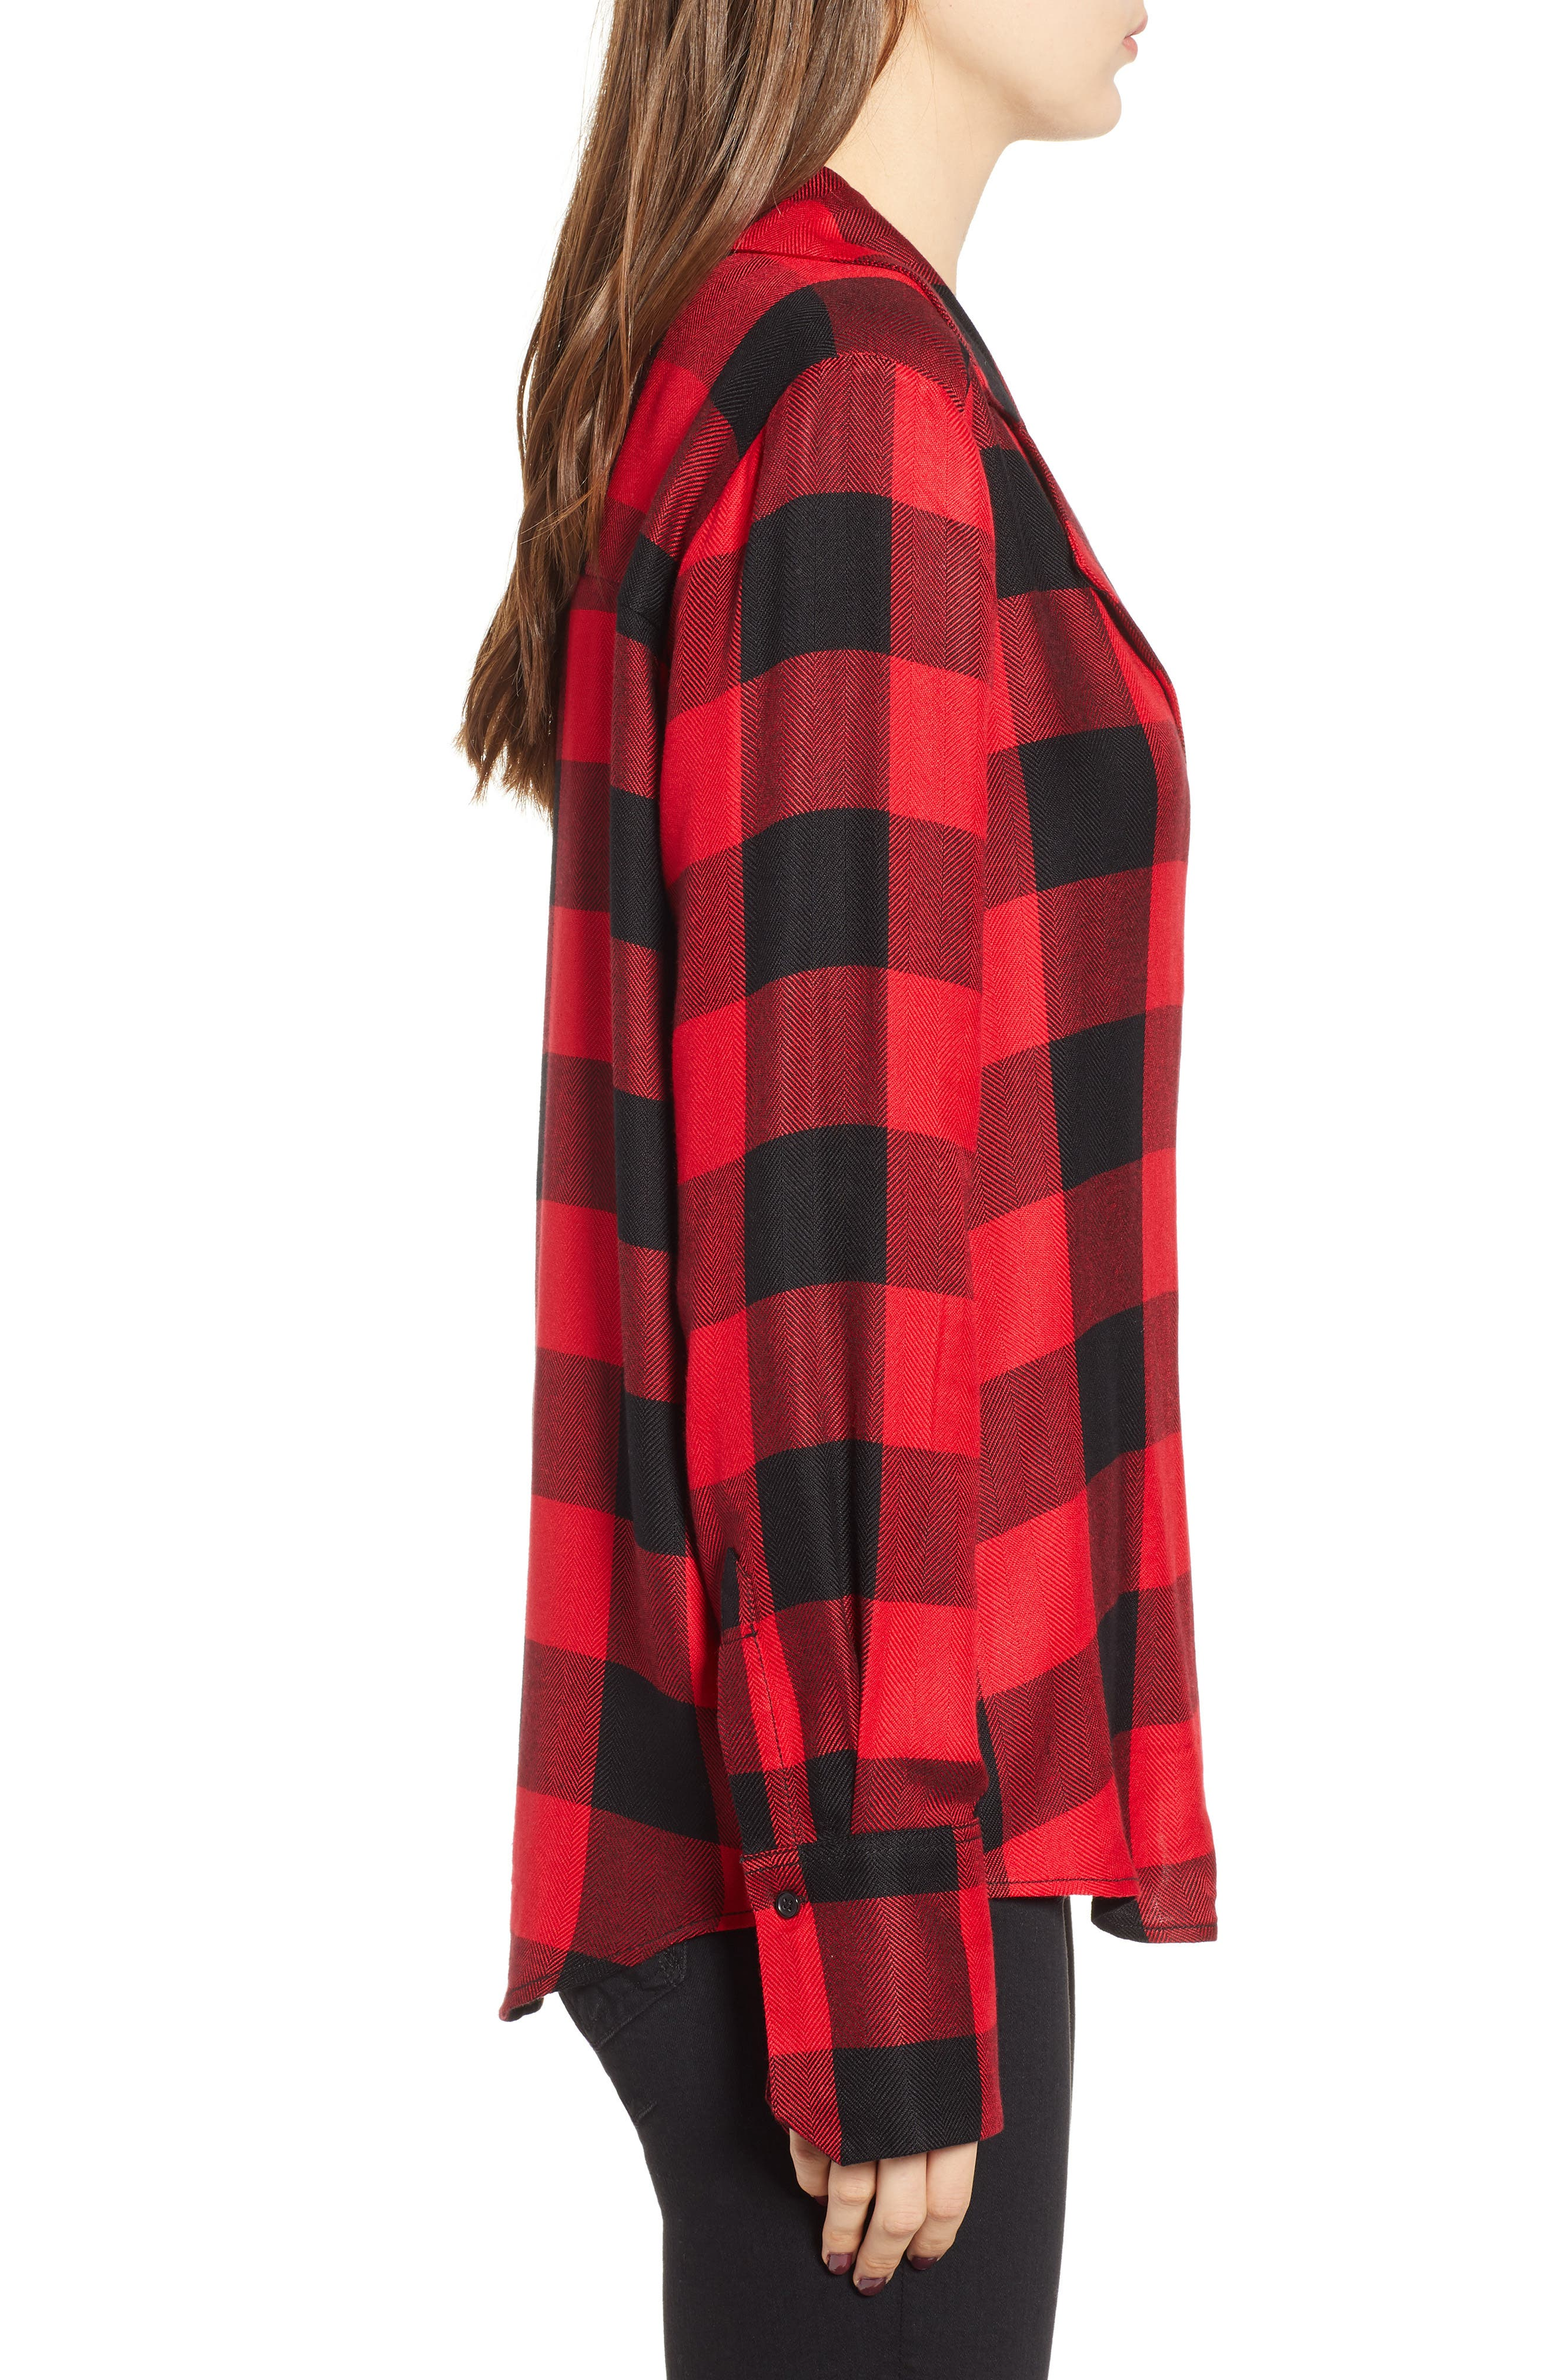 PAIGE,                             Elora Shirt,                             Alternate thumbnail 3, color,                             TRUE RED / BLACK